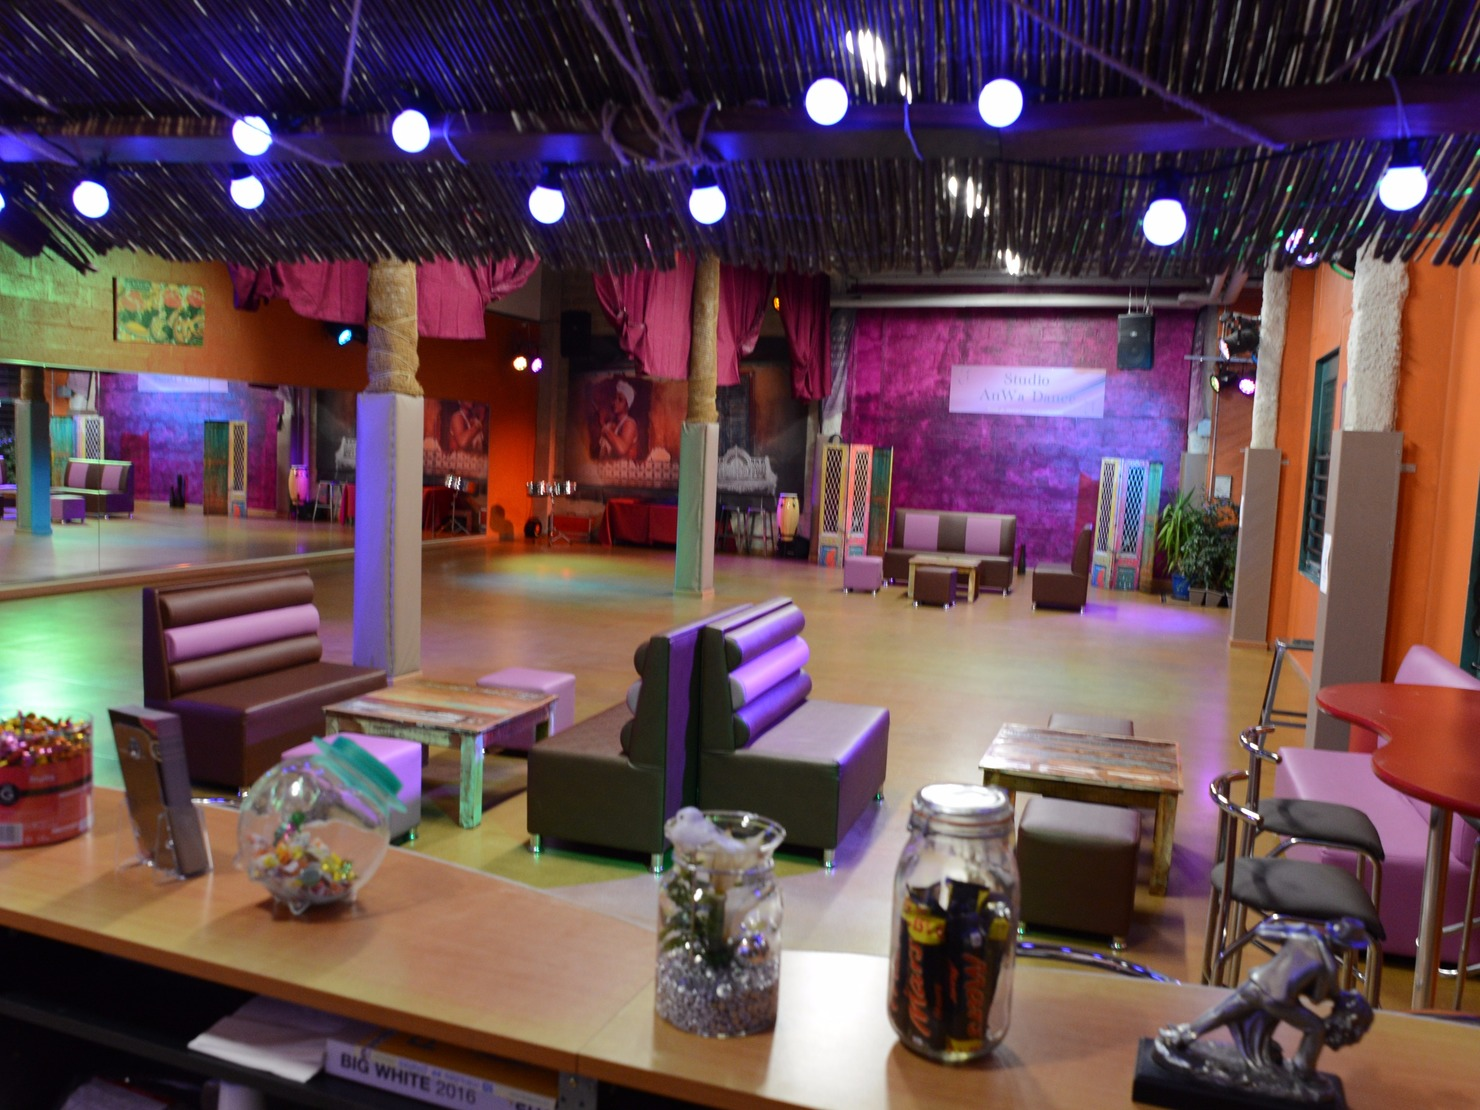 studio anwa dance osny tarifs avis horaires essai gratuit. Black Bedroom Furniture Sets. Home Design Ideas